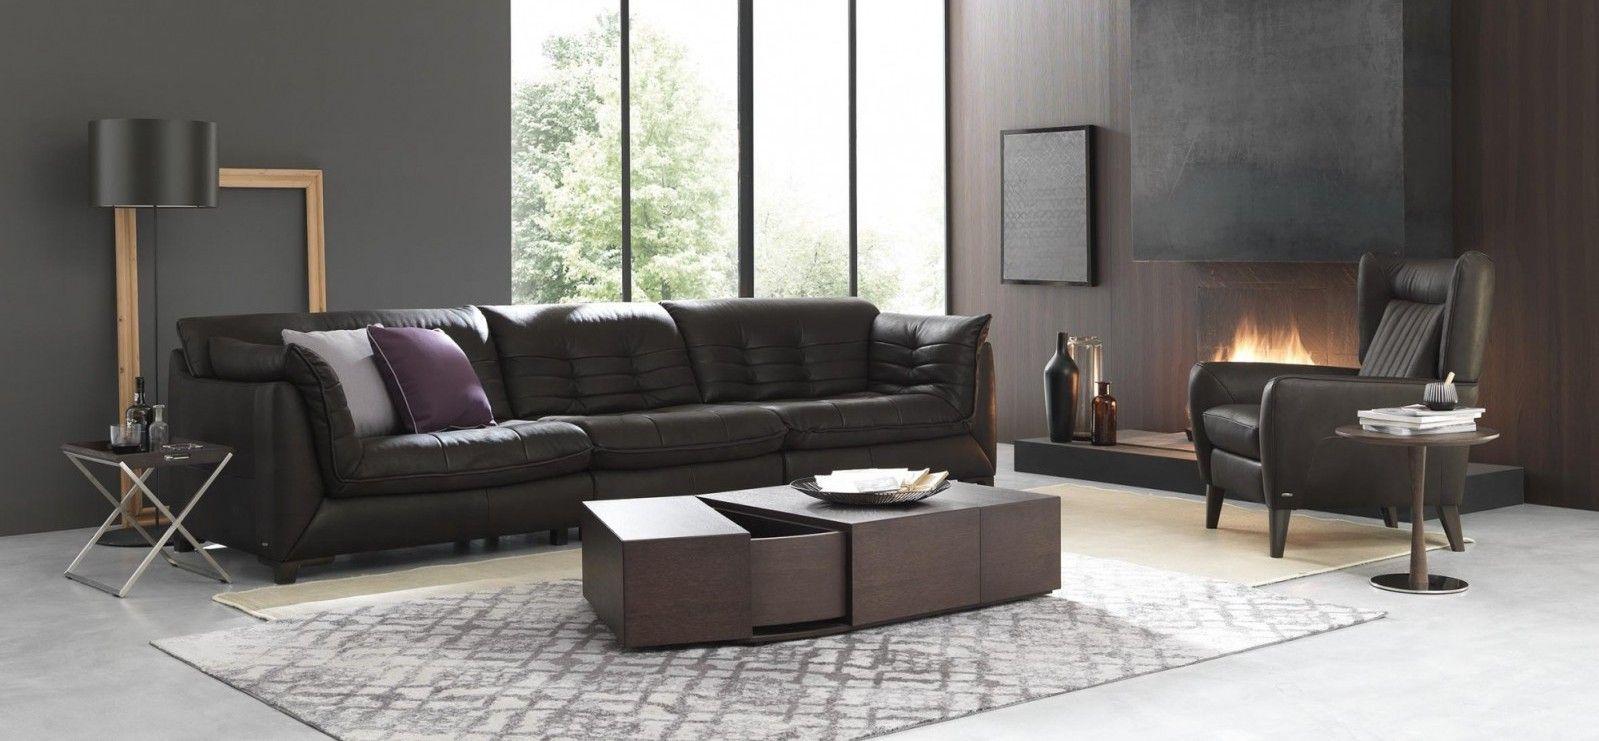 Natuzzi Furniture Living Room Sofa Natuzzi